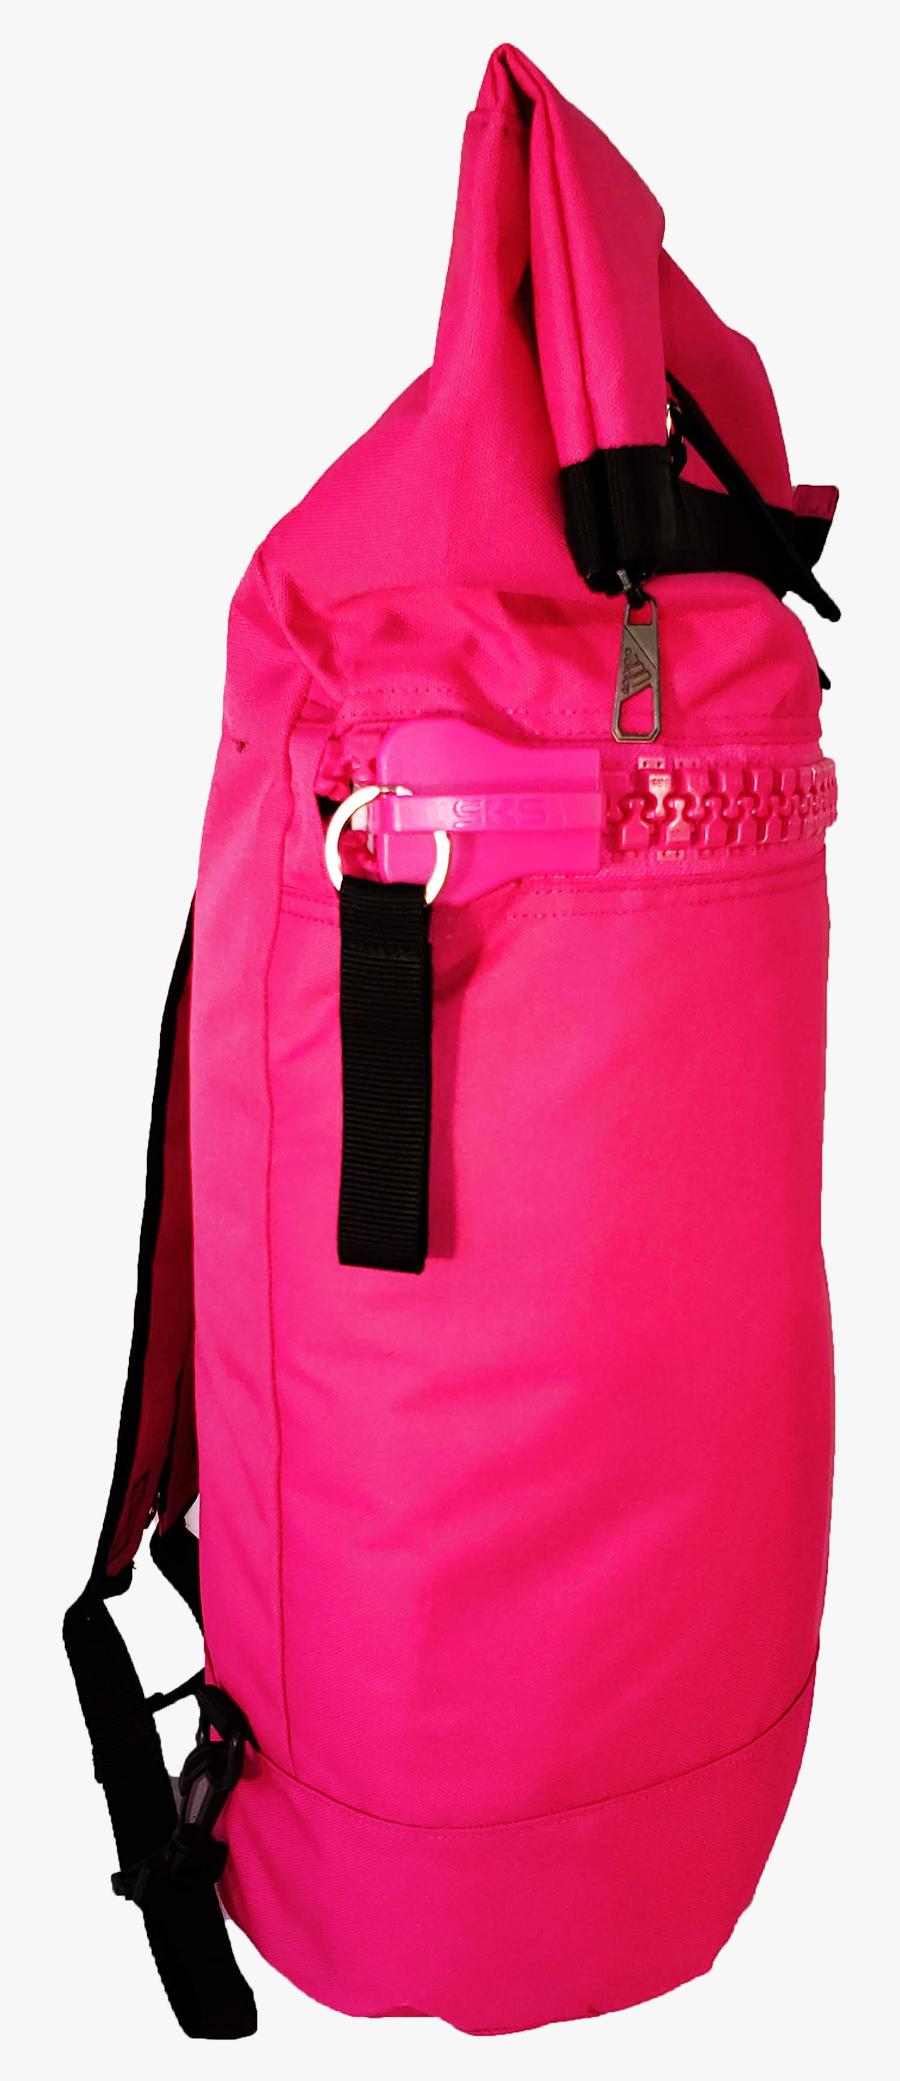 Pink Transparent Backpack - Diaper Bag, Transparent Clipart